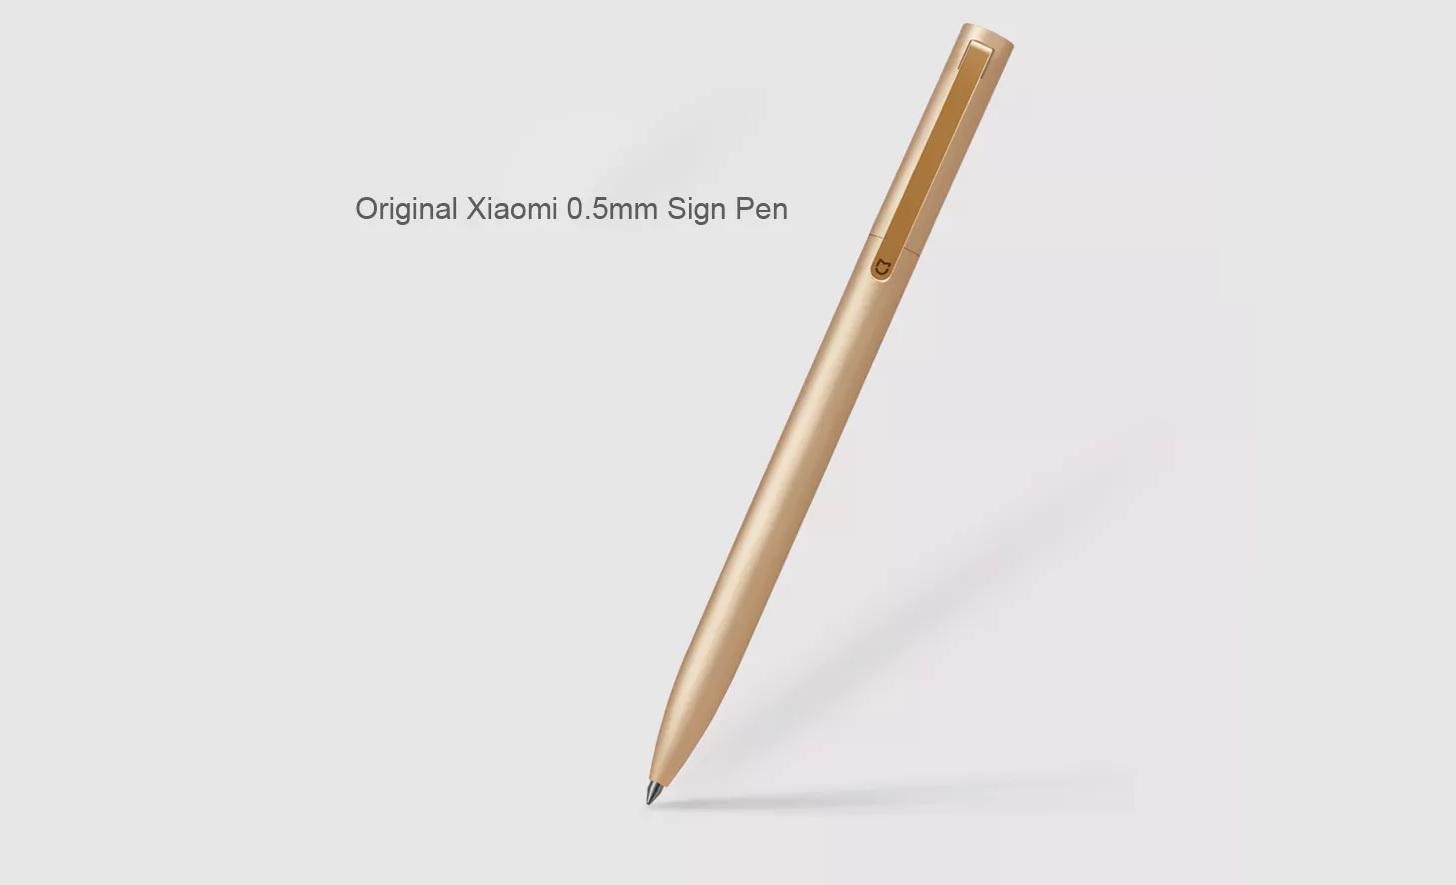 Xiaomi Mijia 0.5mm Pen